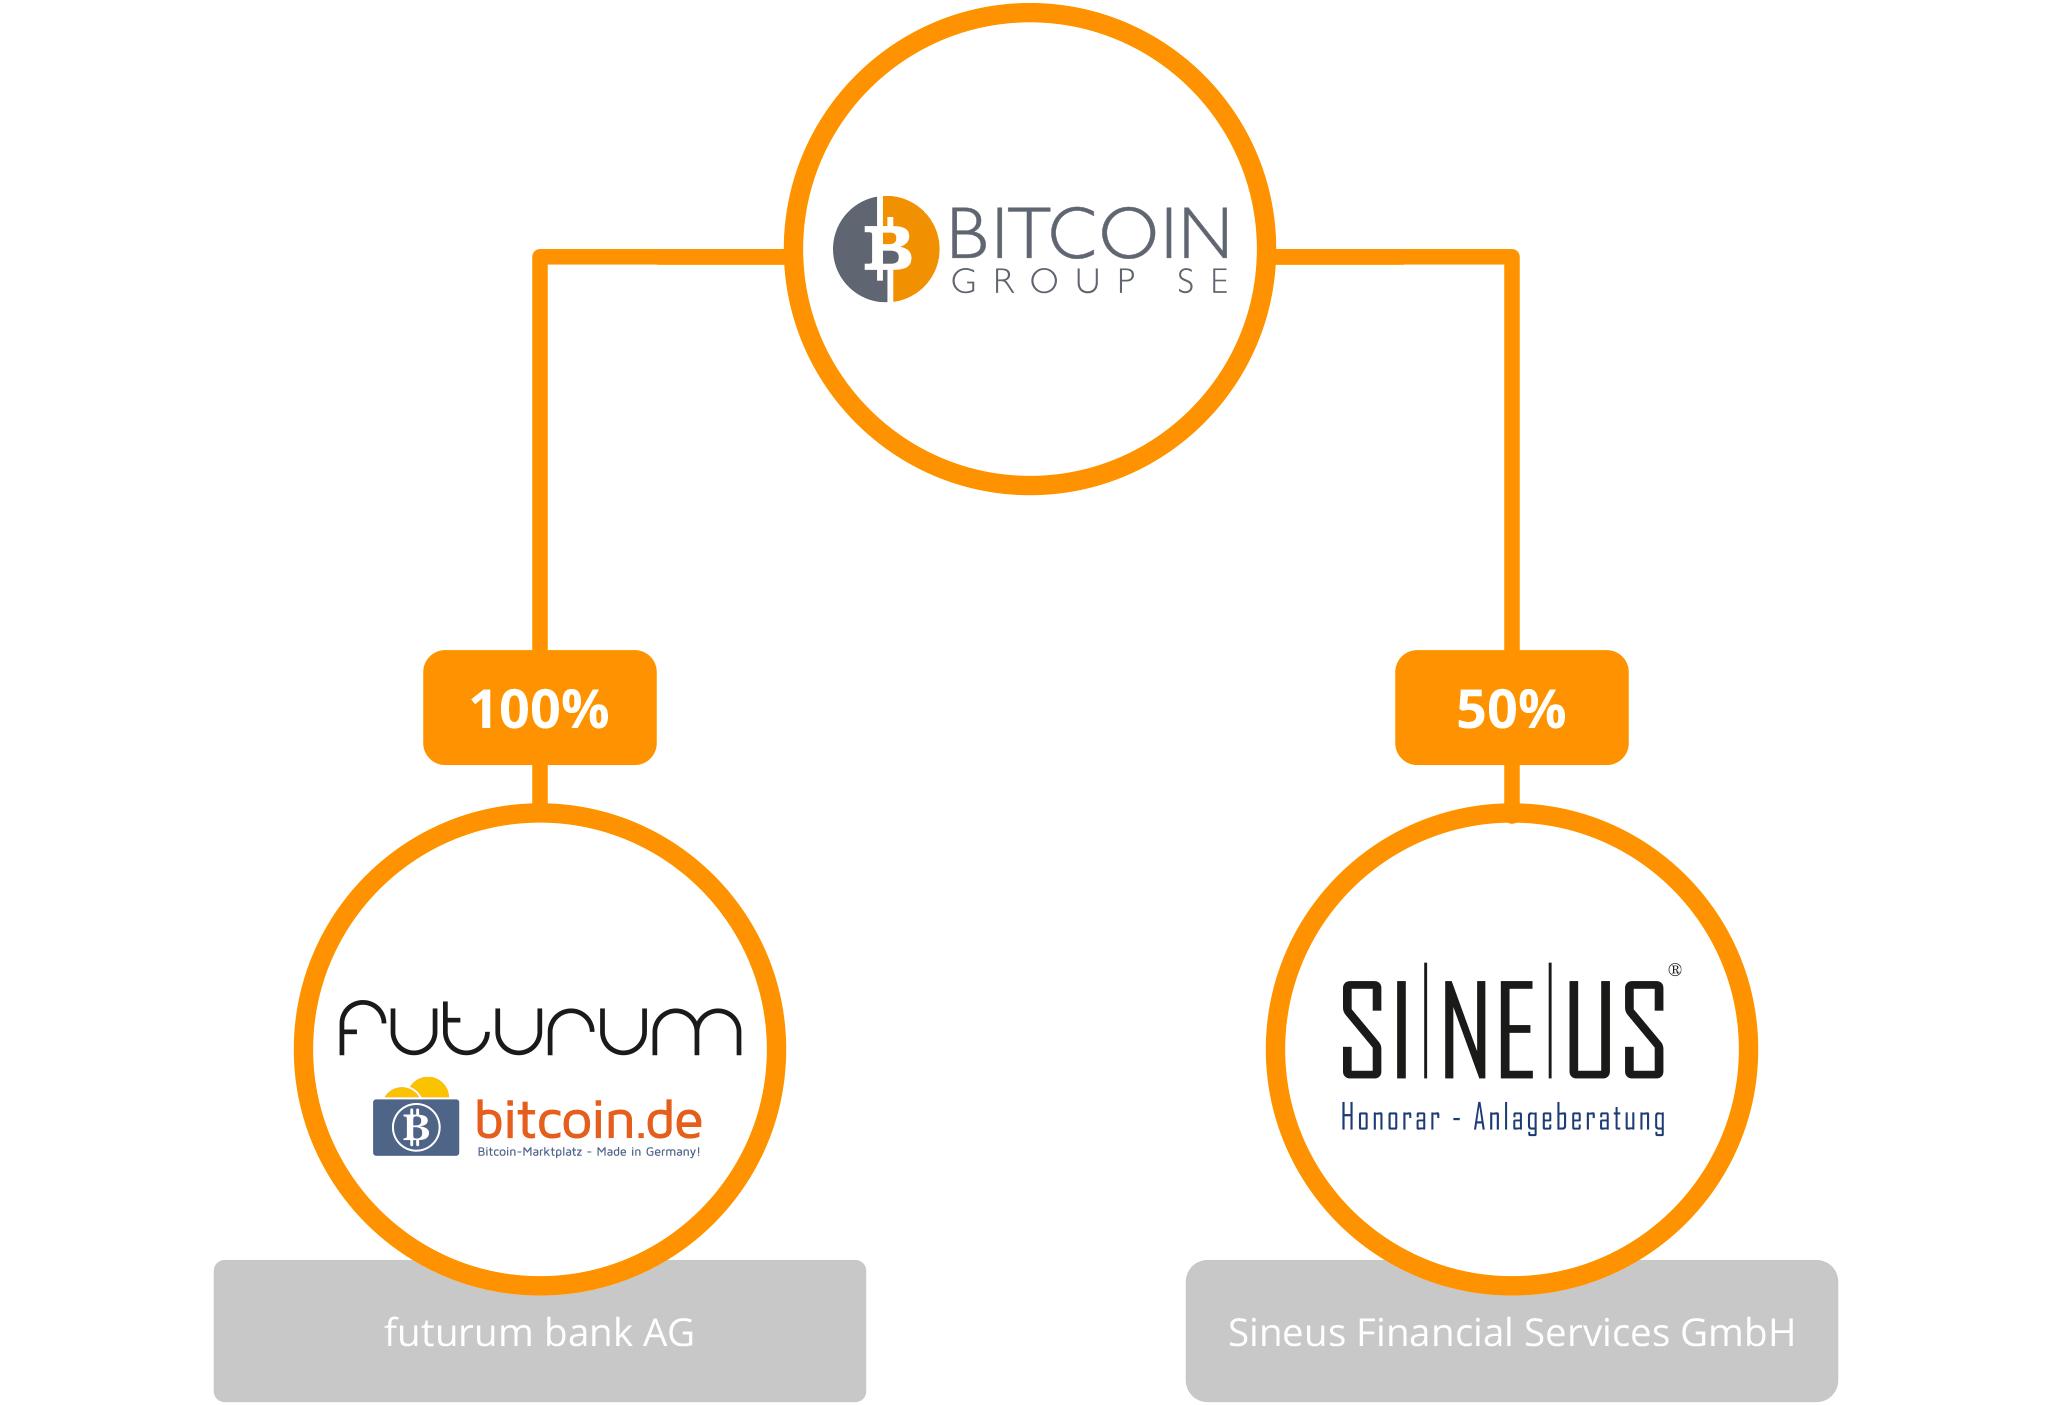 bitcoin group se)